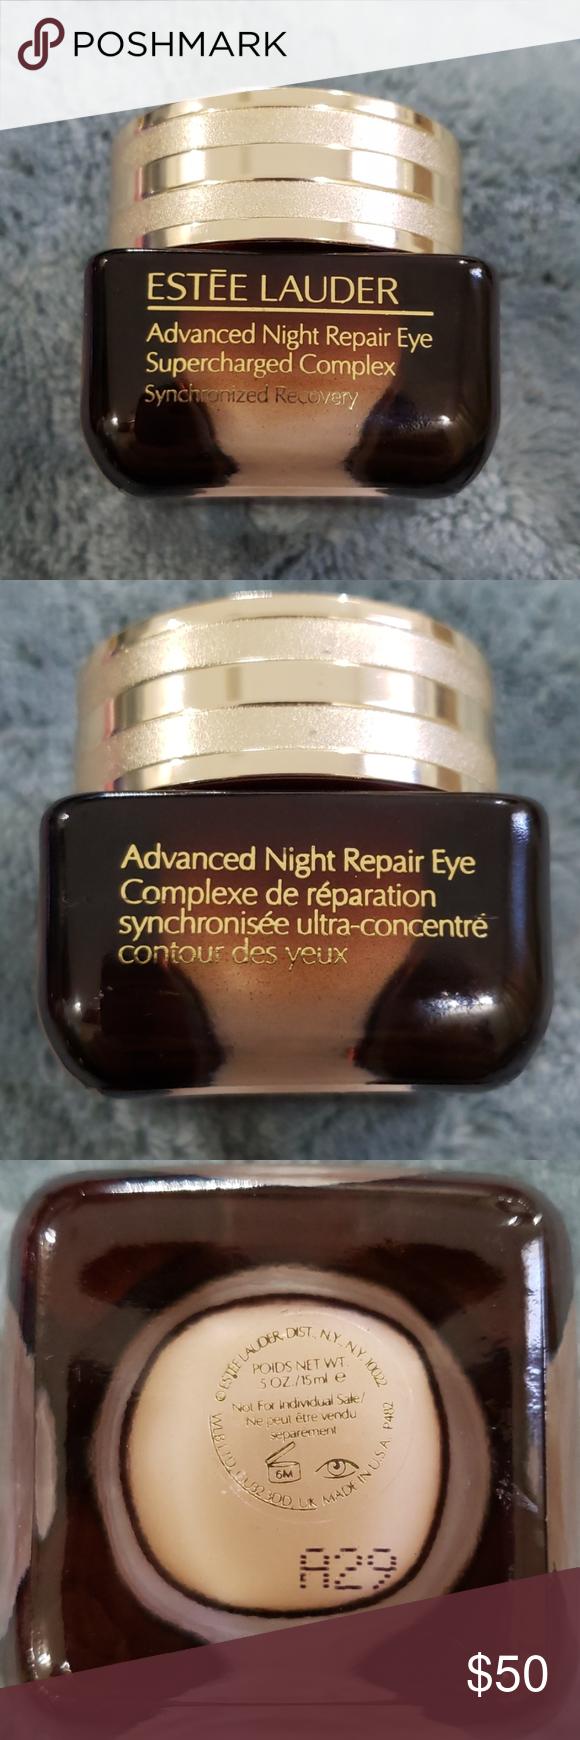 Eye Creams I just added this listing on Poshmark Estee Lauder Advanced Night Repair Eye Cream 05oz